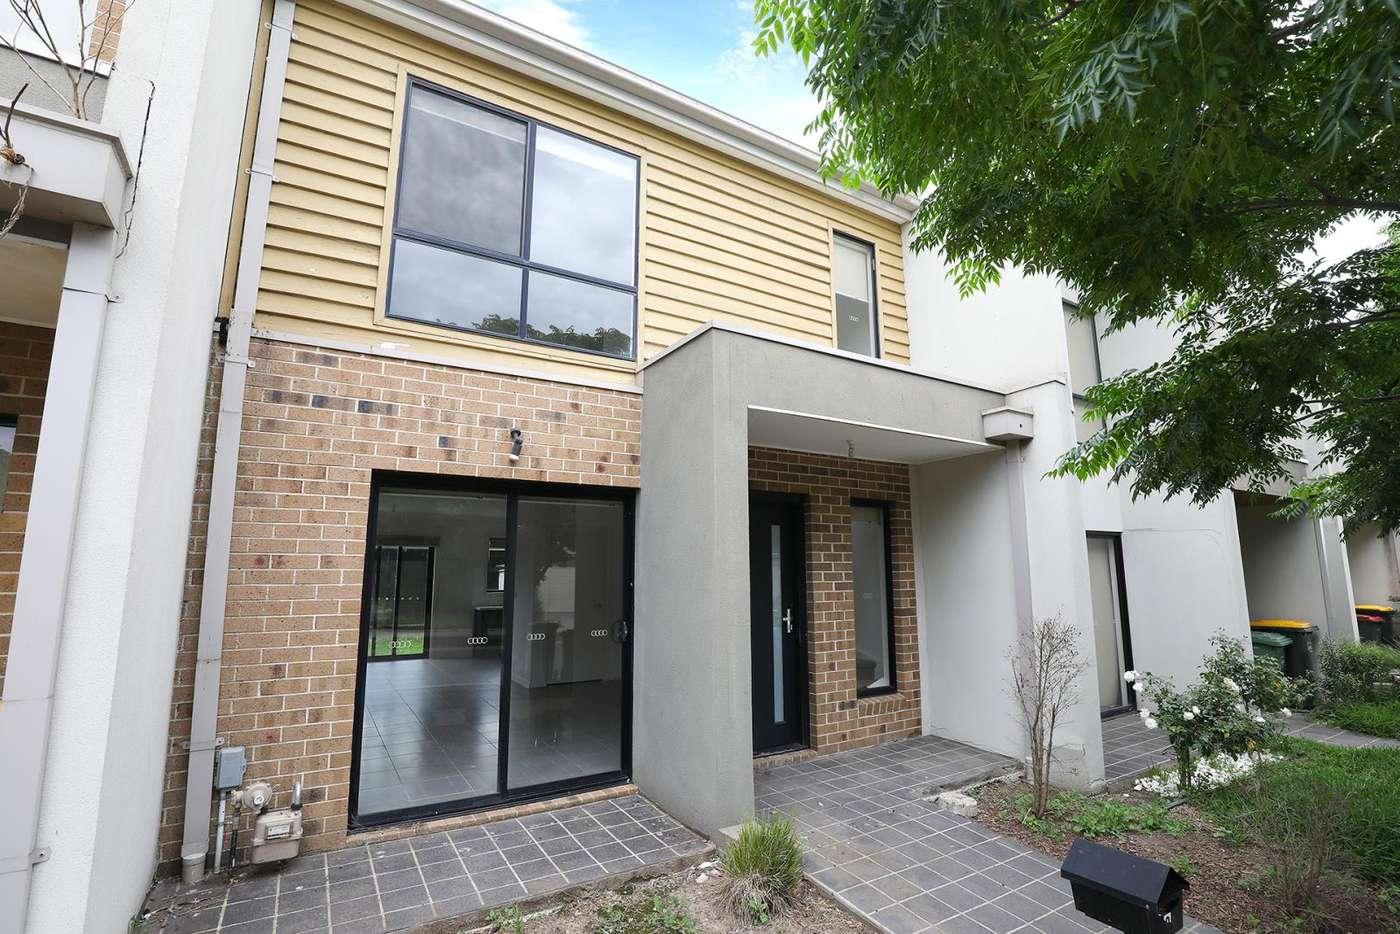 Main view of Homely townhouse listing, 23 Huntingfield Street, Craigieburn VIC 3064